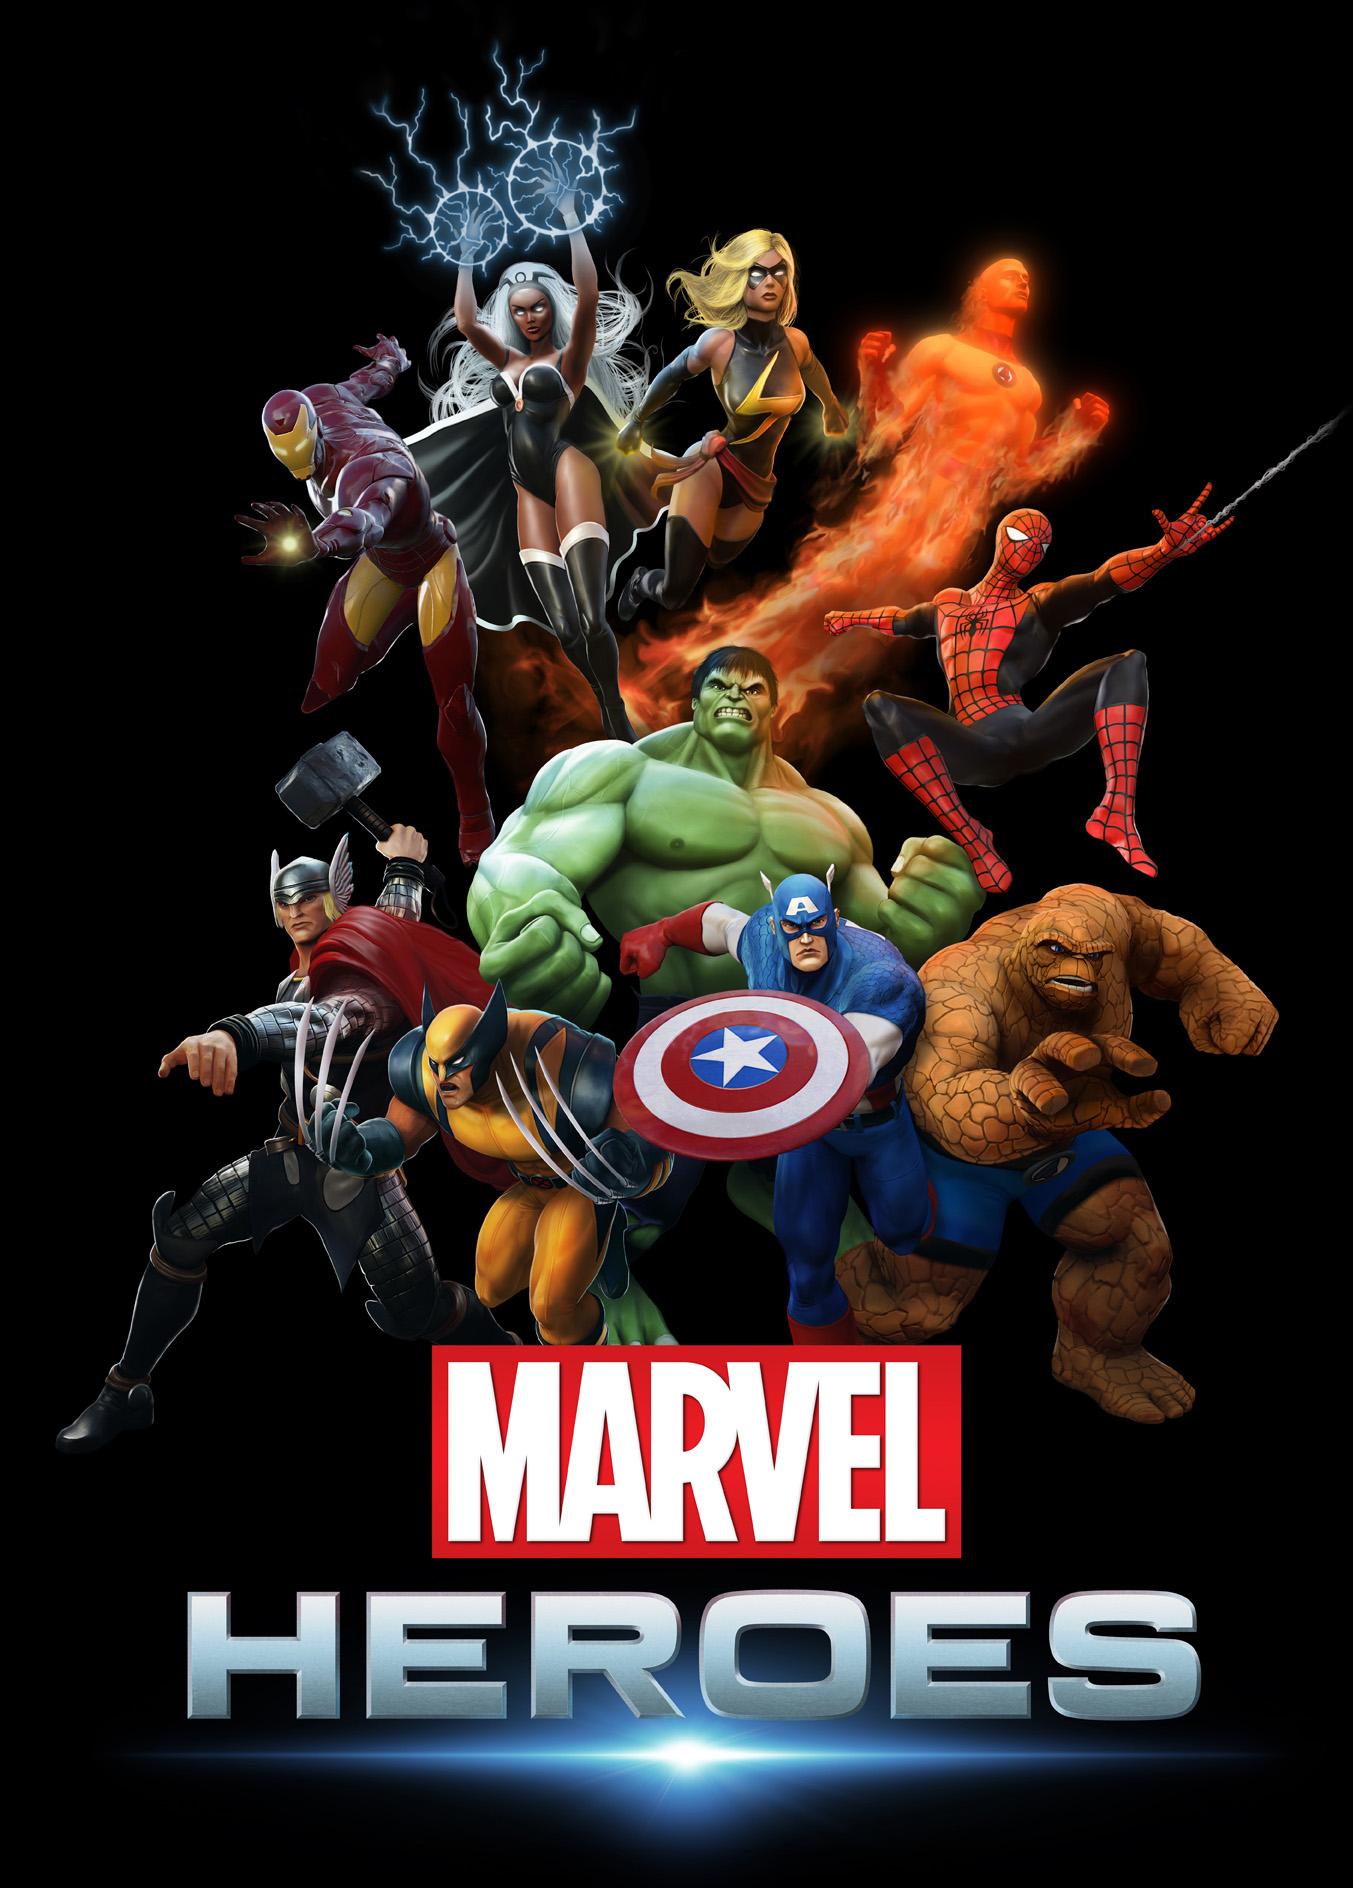 MarvelHeroes_SDCC_2011_KeyArt